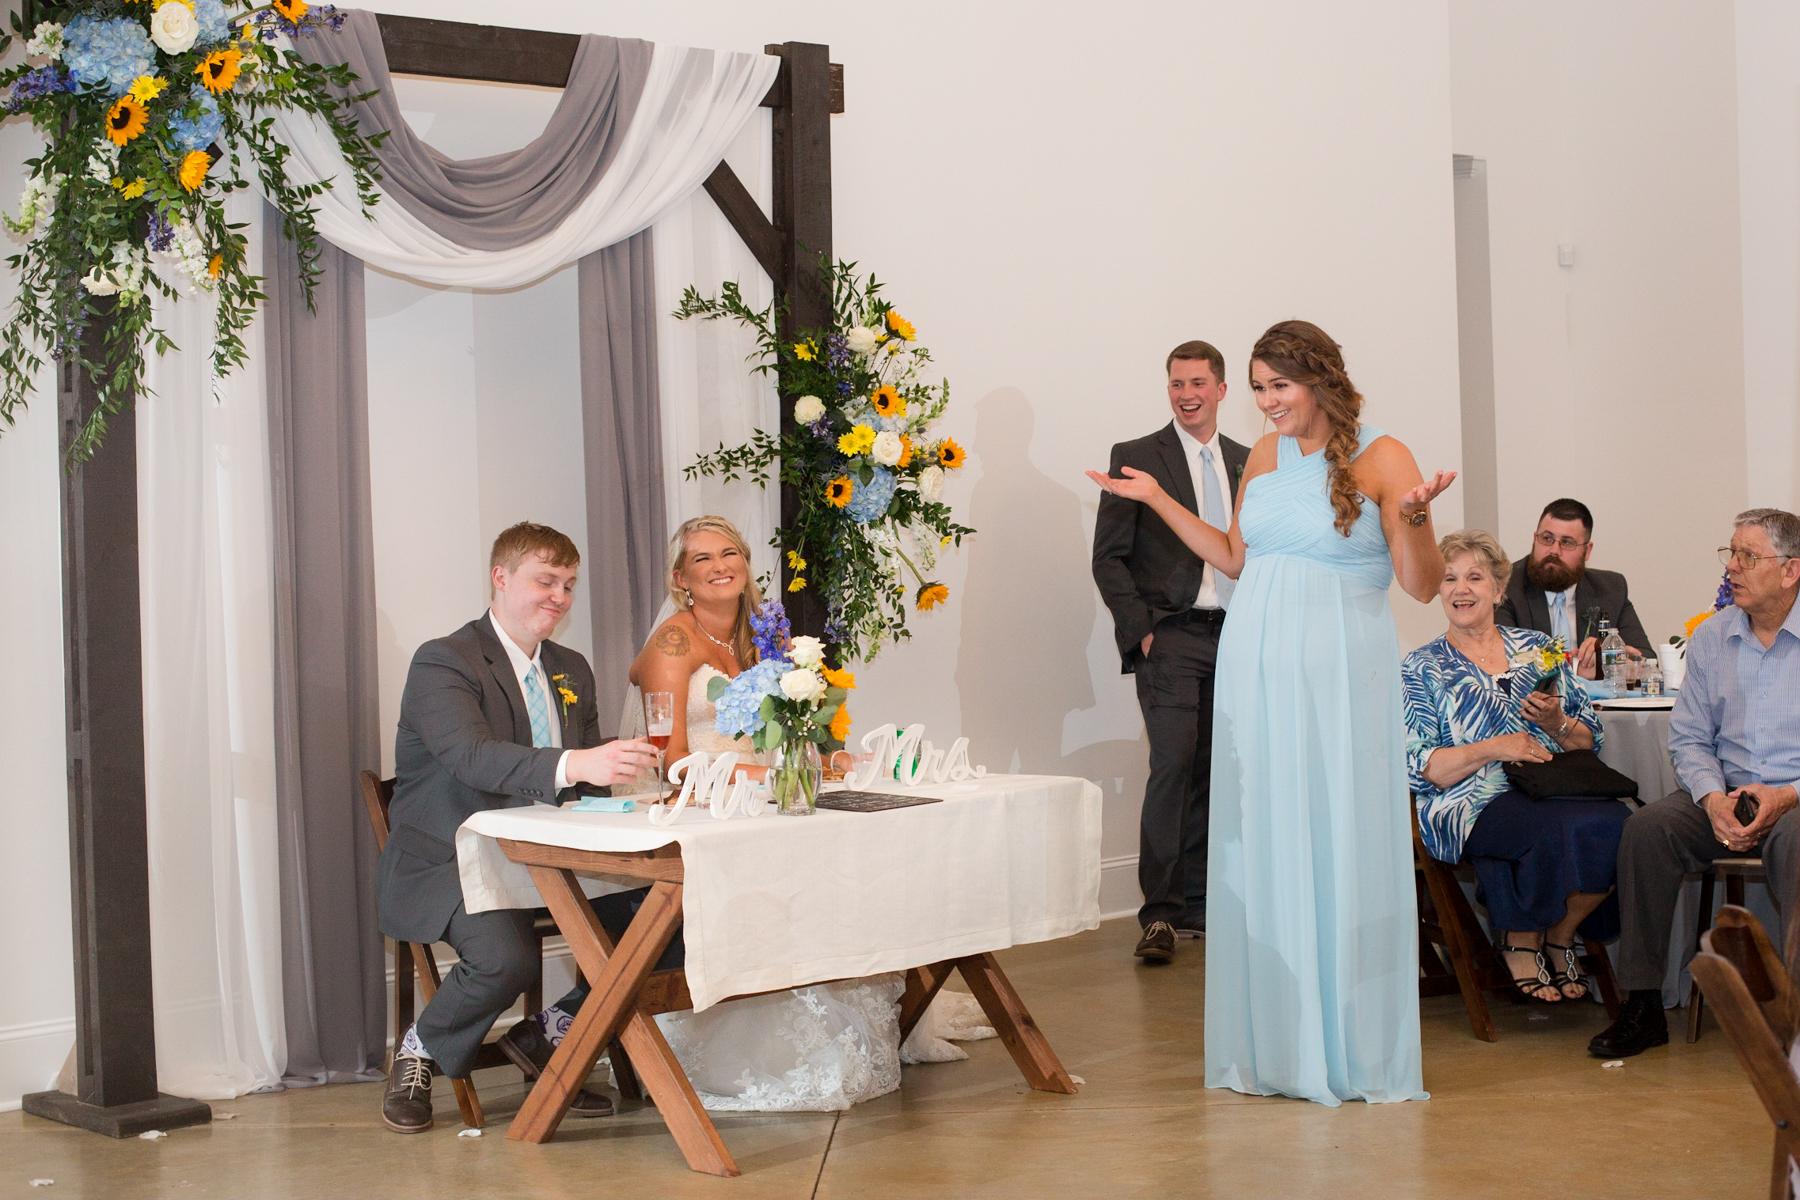 The-venue-at-white-oak-farms-wedding-nashville-wedding-photographers-0319.jpg